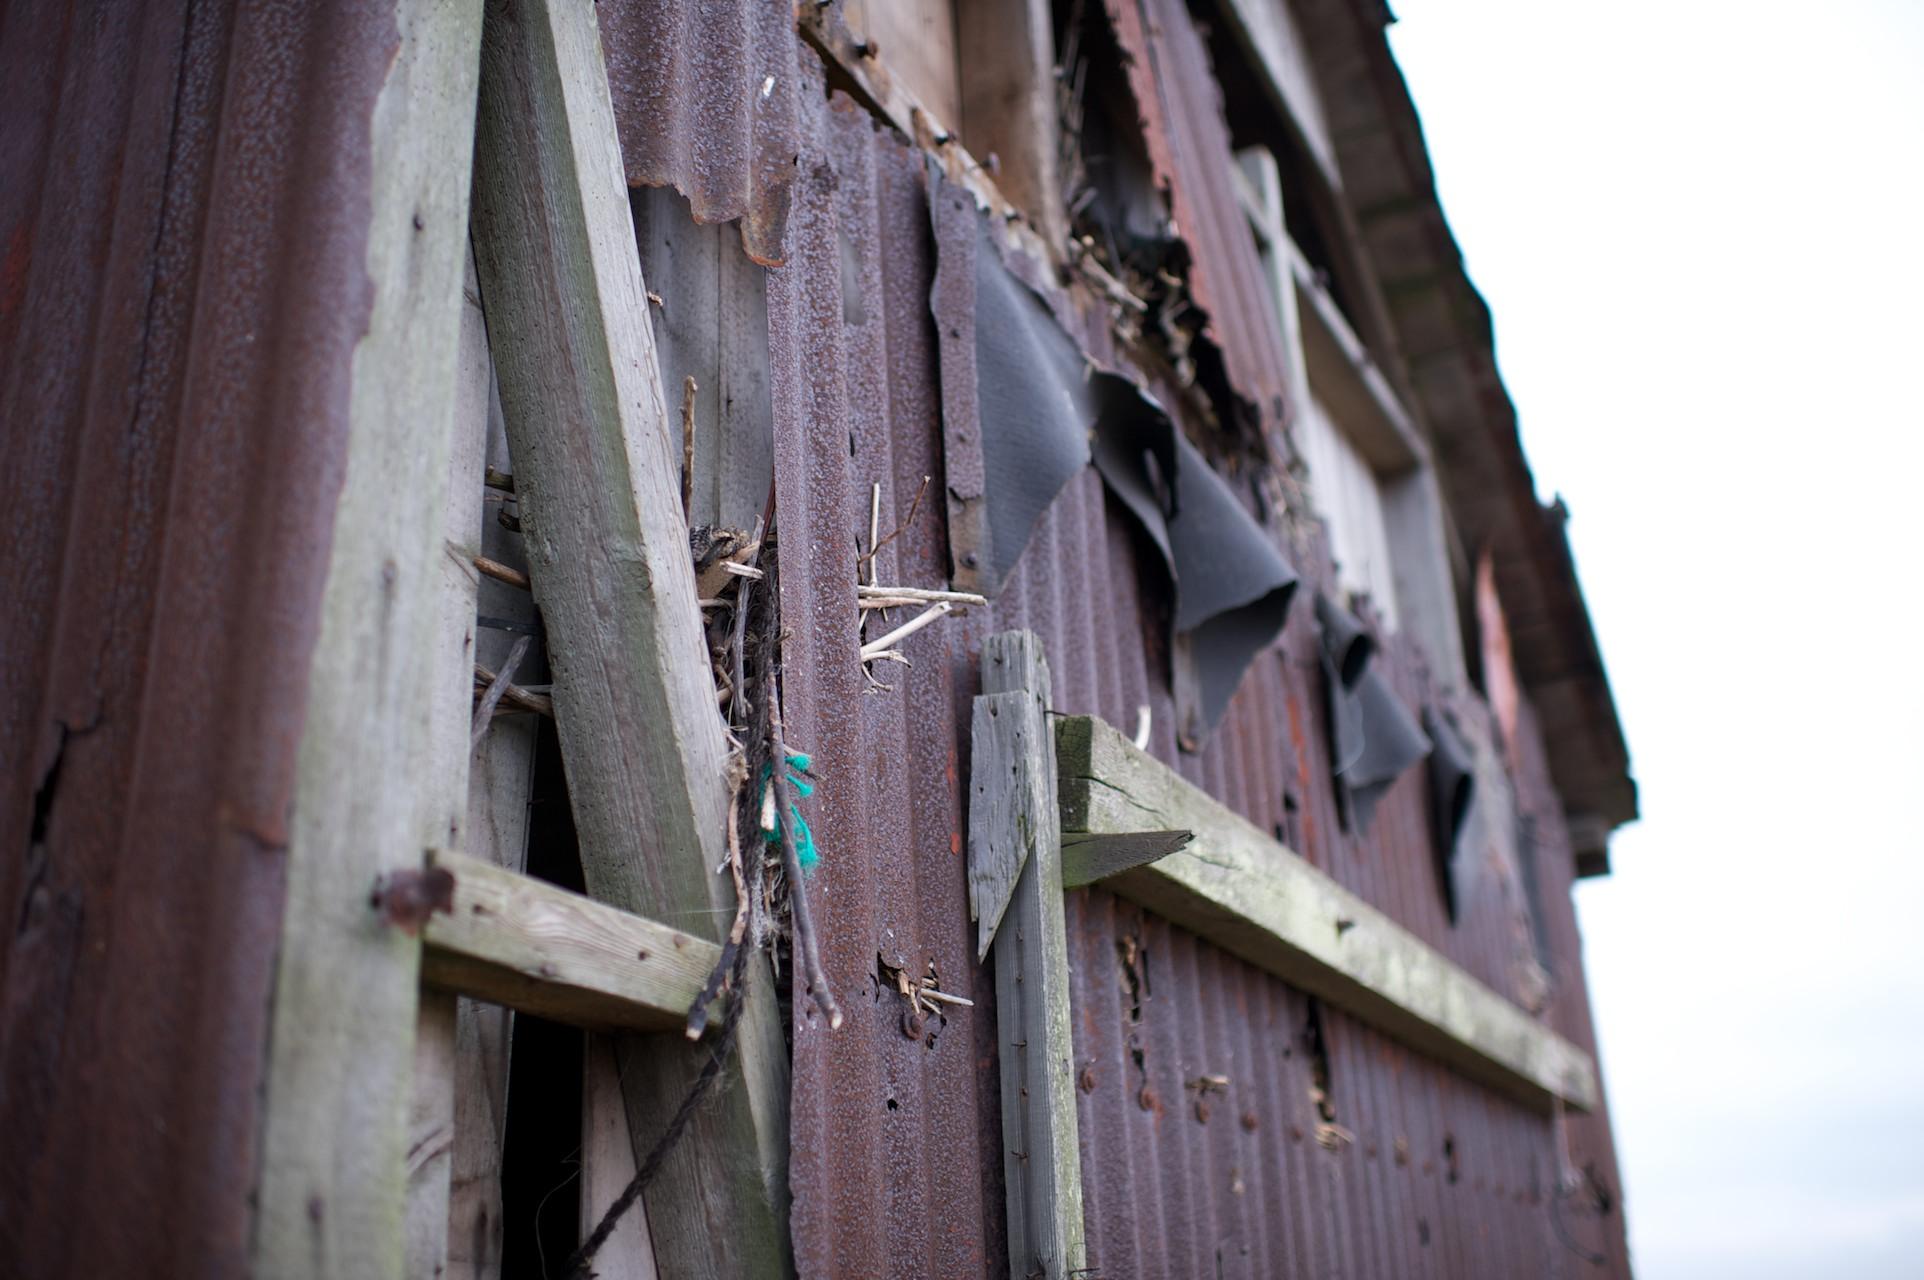 Close-up detail shot of a knackered barn door